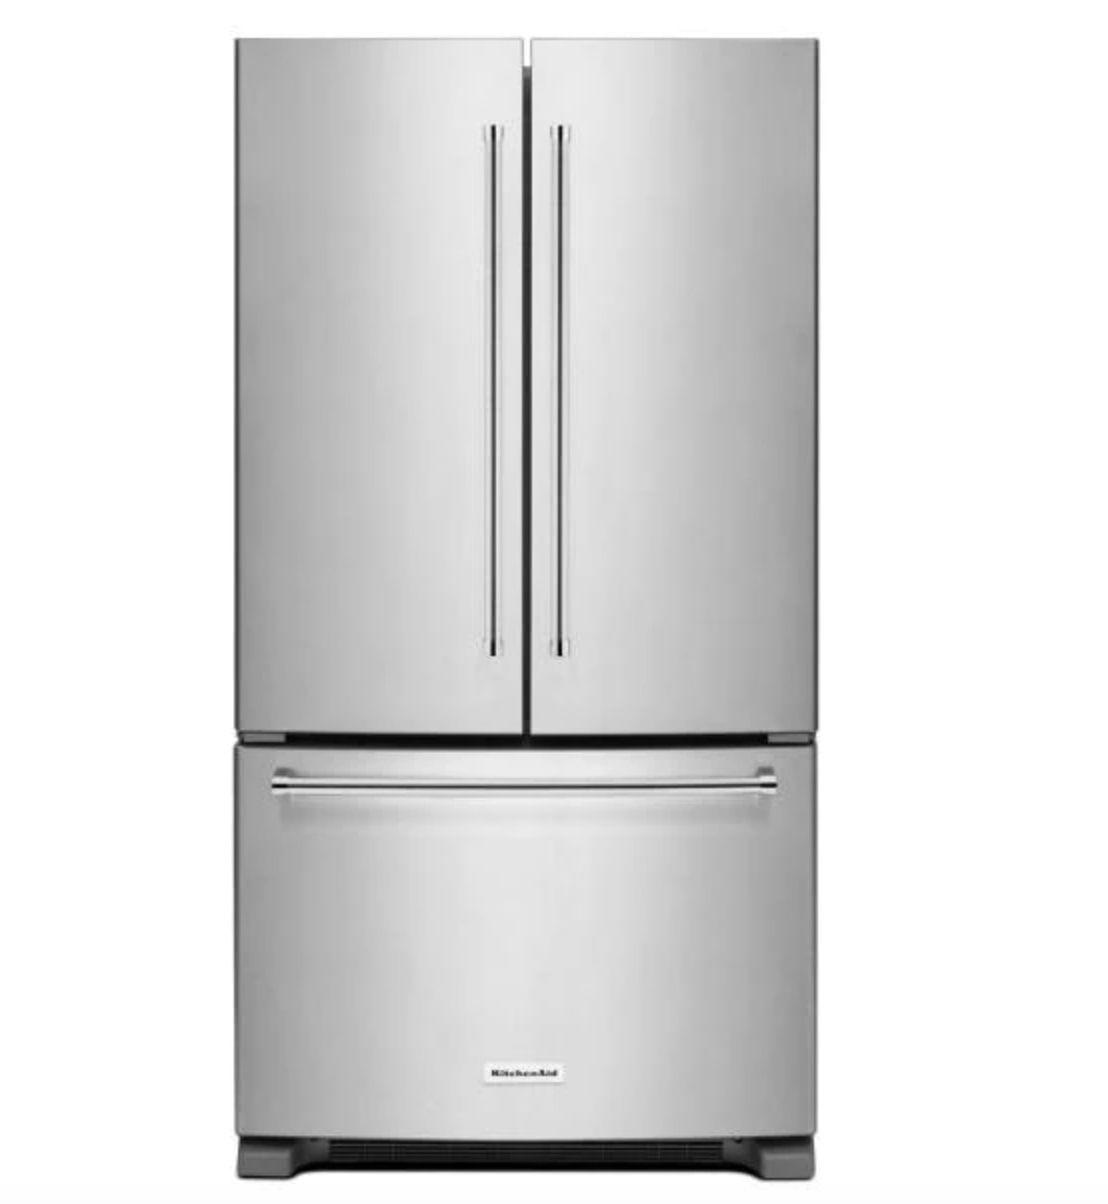 kitchen-aid-french-door-counter-depth-refrigerator